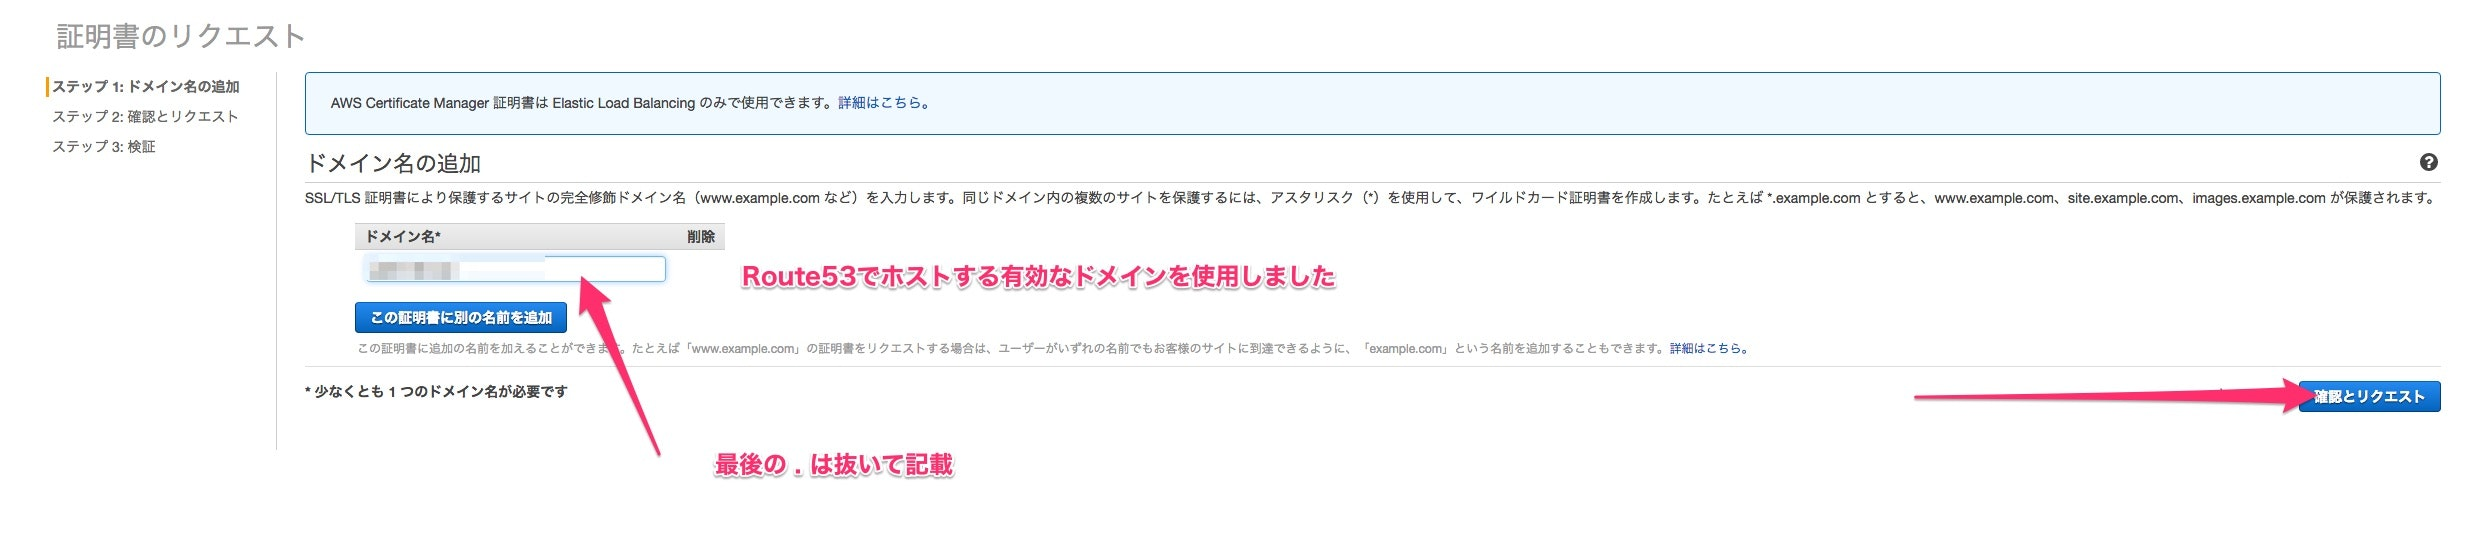 AWS_Certificate_Manager_01.jpg